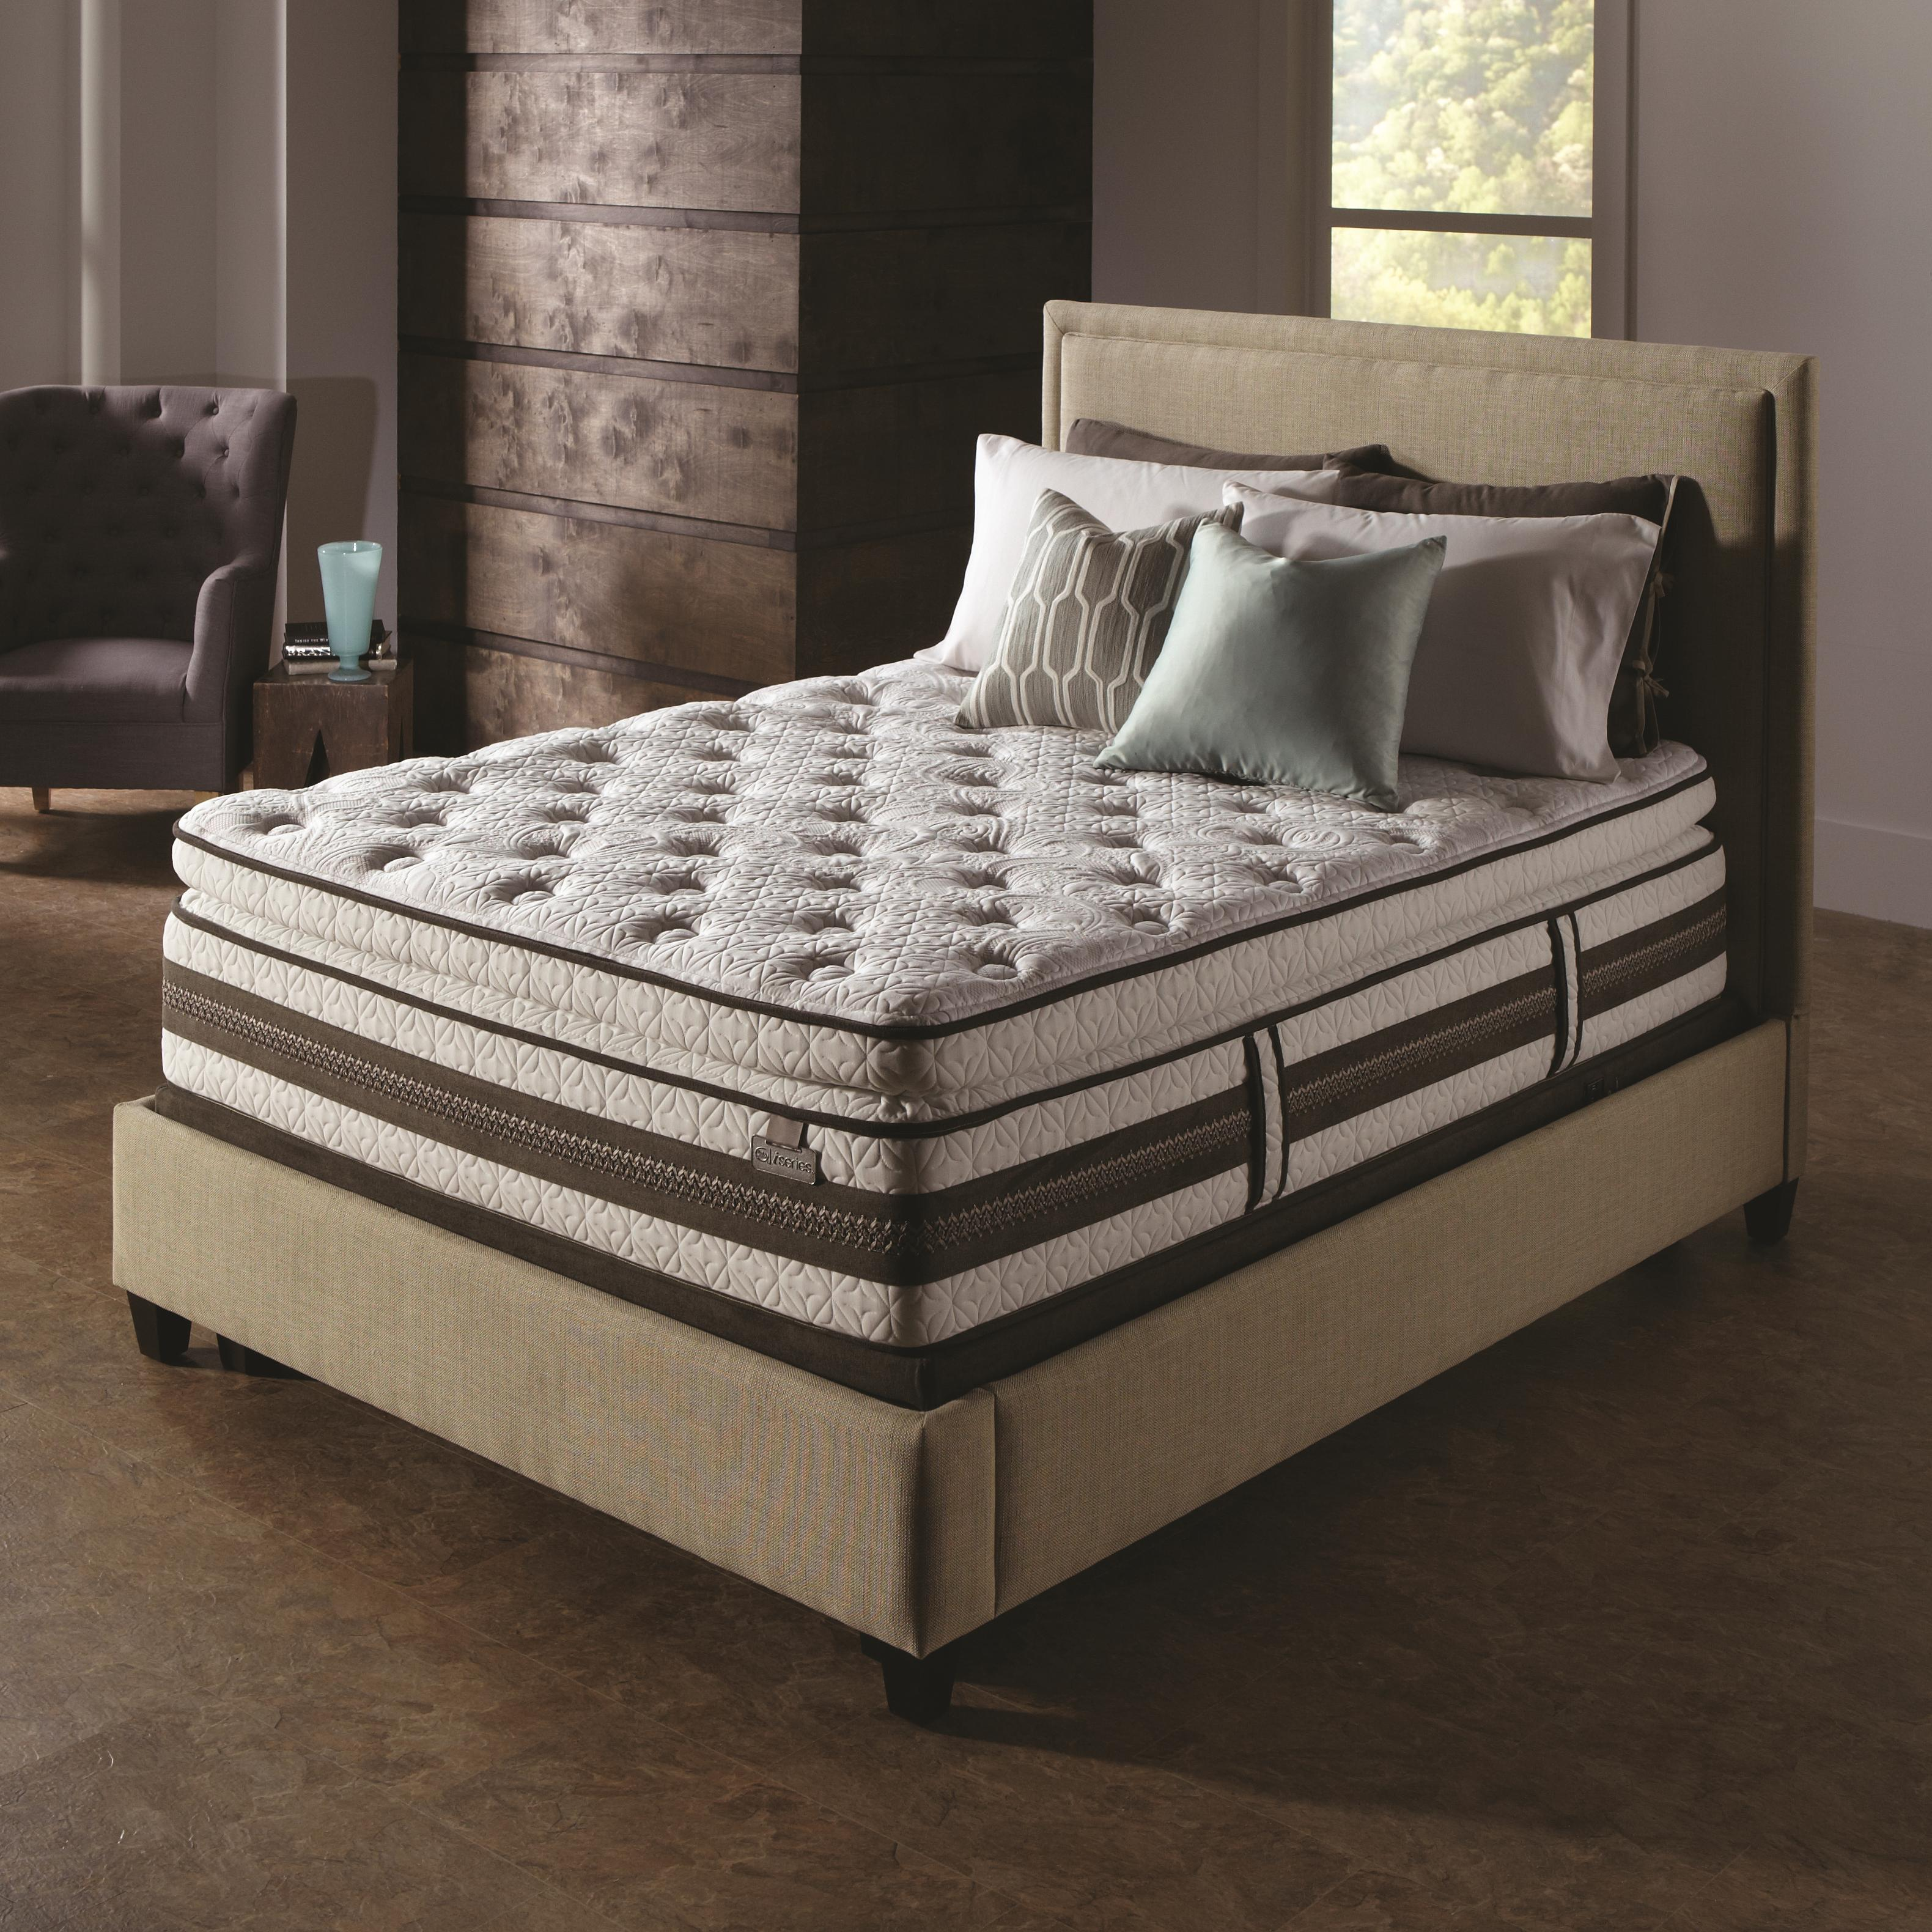 Serta iSeries Profiles Honoree Twin XL Super Pillow Top Mattress  - Item Number: 400833TXL